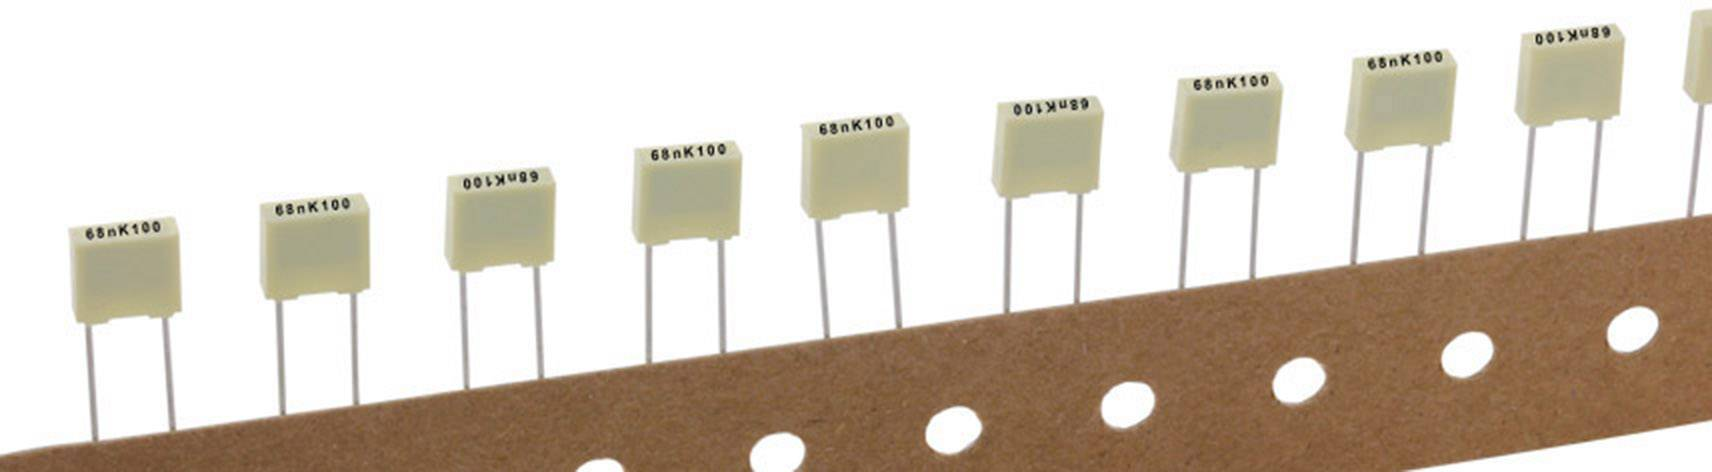 Polyesterový kondenzátor Kemet R82EC2220DQ50K+ radiální, 22 nF, 100 V,10 %, 5 mm, (d x š x v) 7.2 x 2.5 mm x 6.5 mm, 1 ks